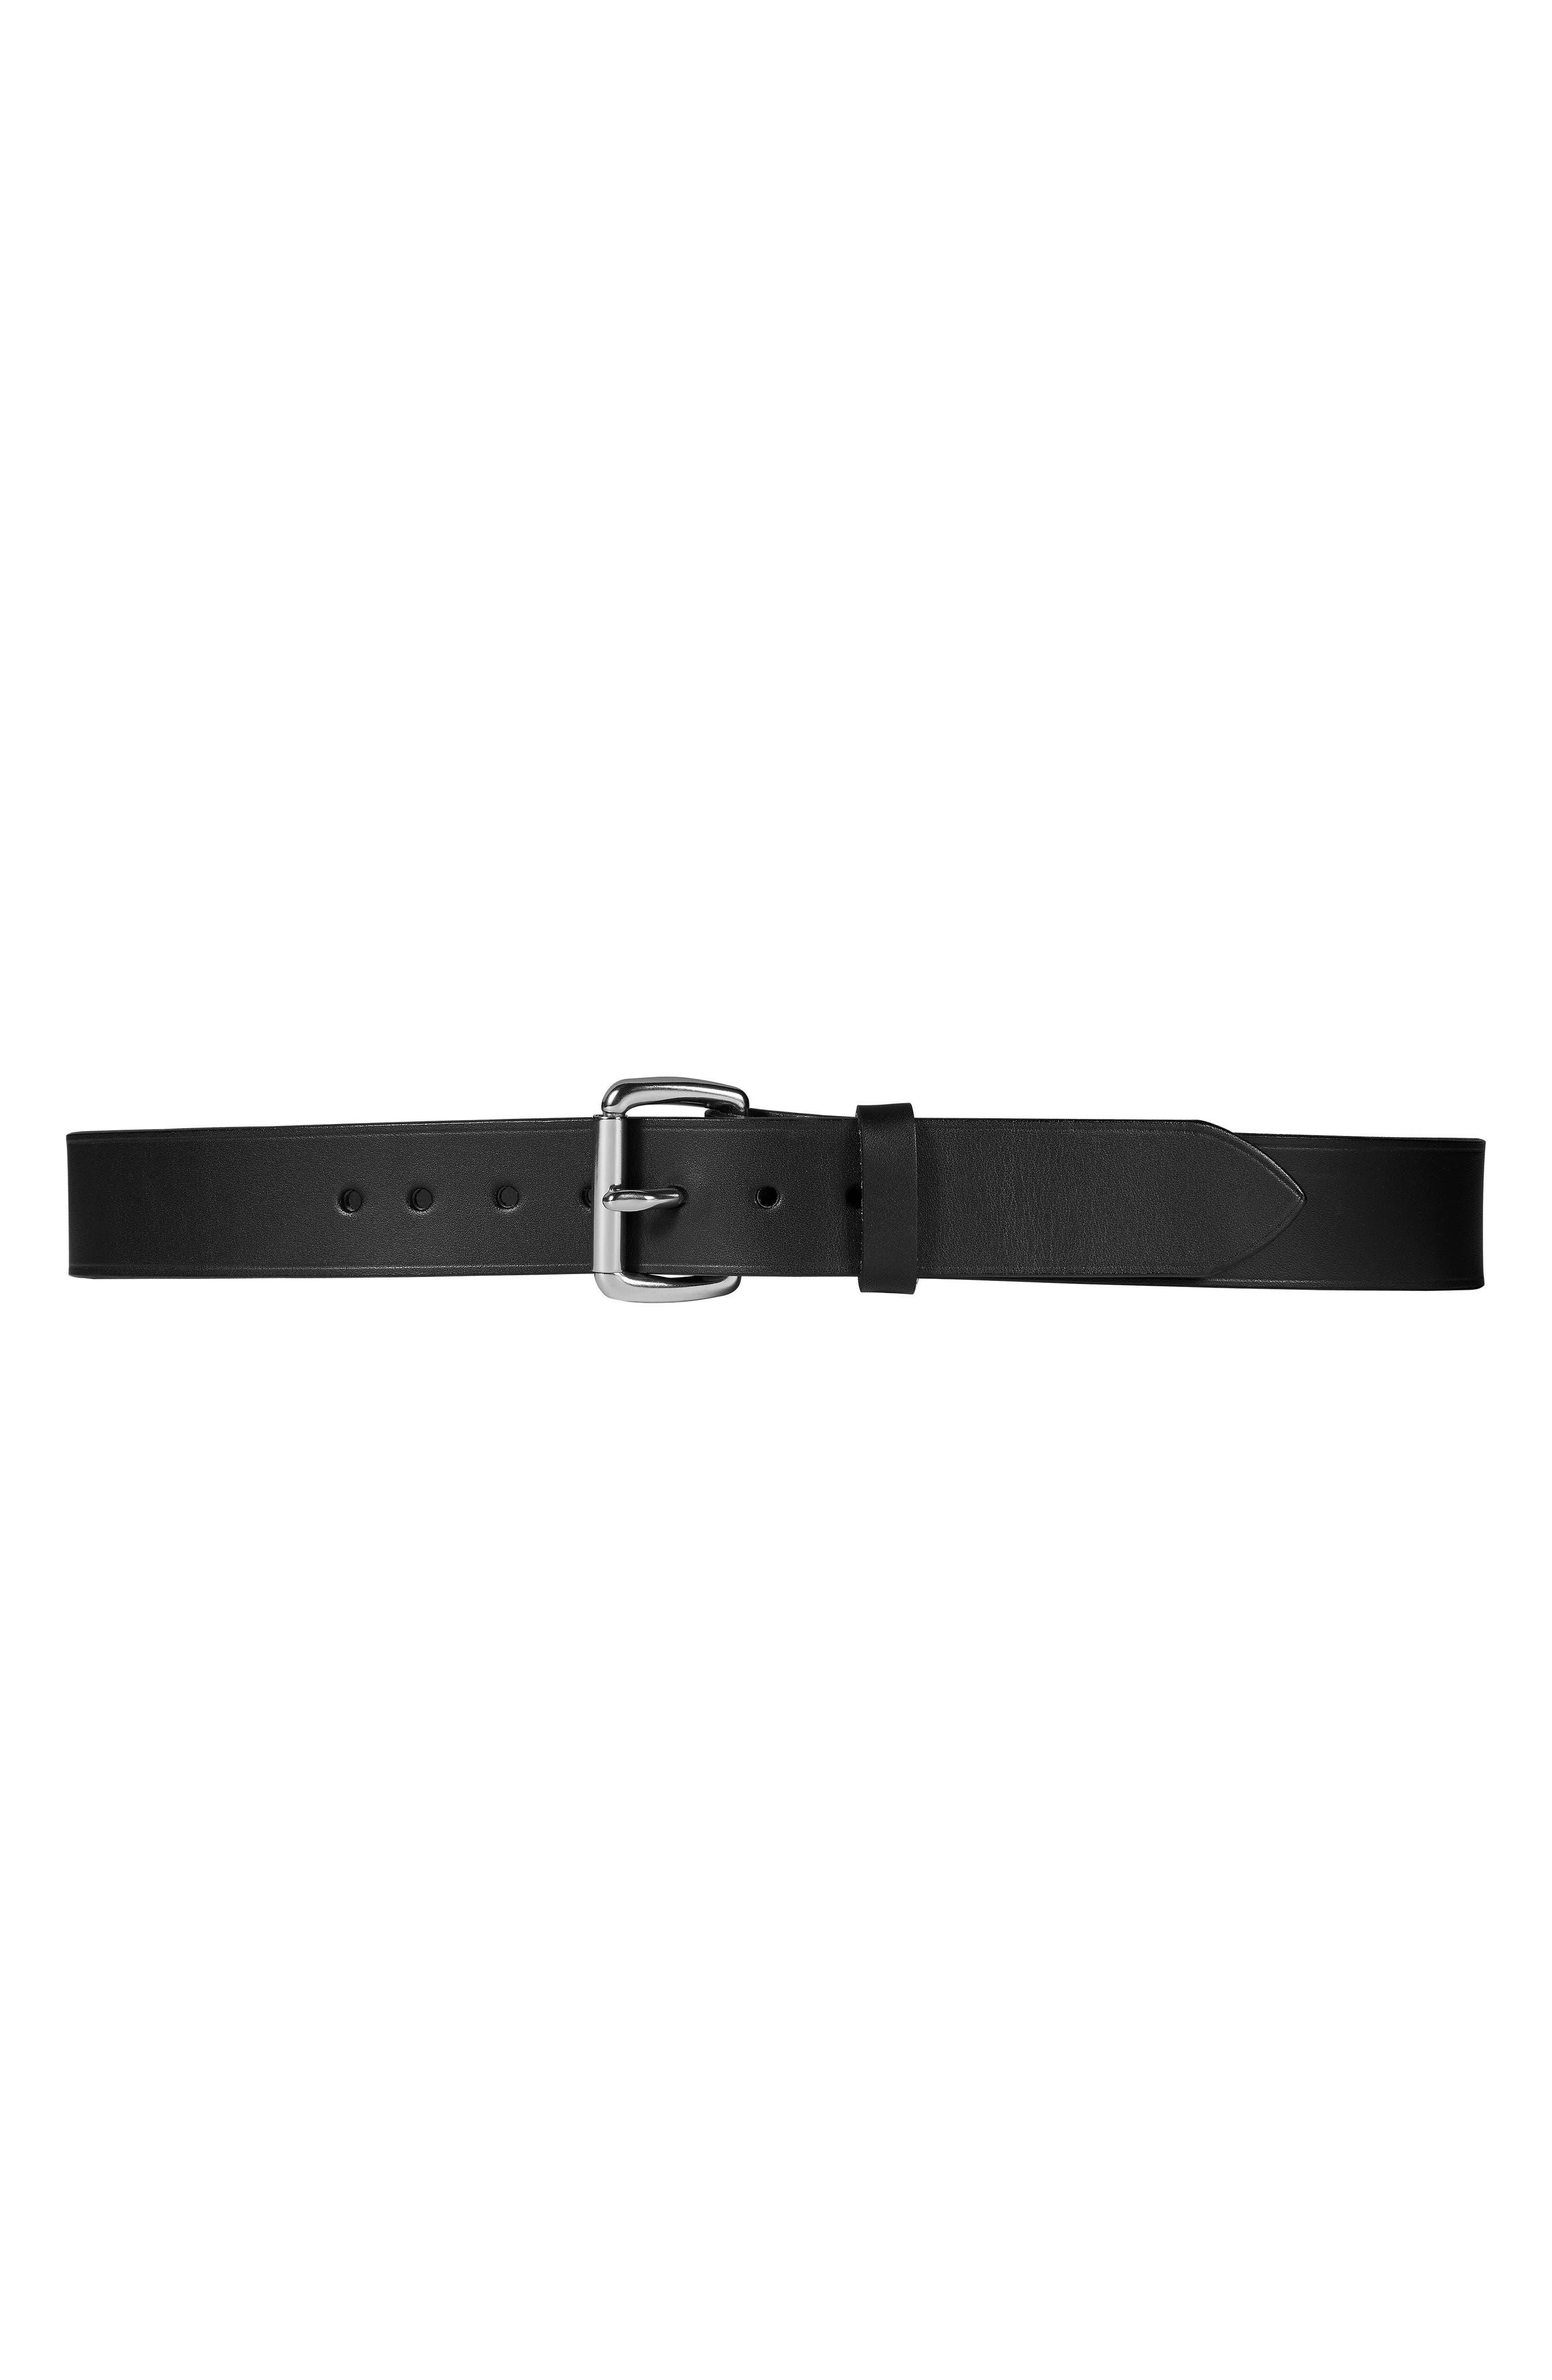 Filson Bridle Leather Belt, Black/ Stainless